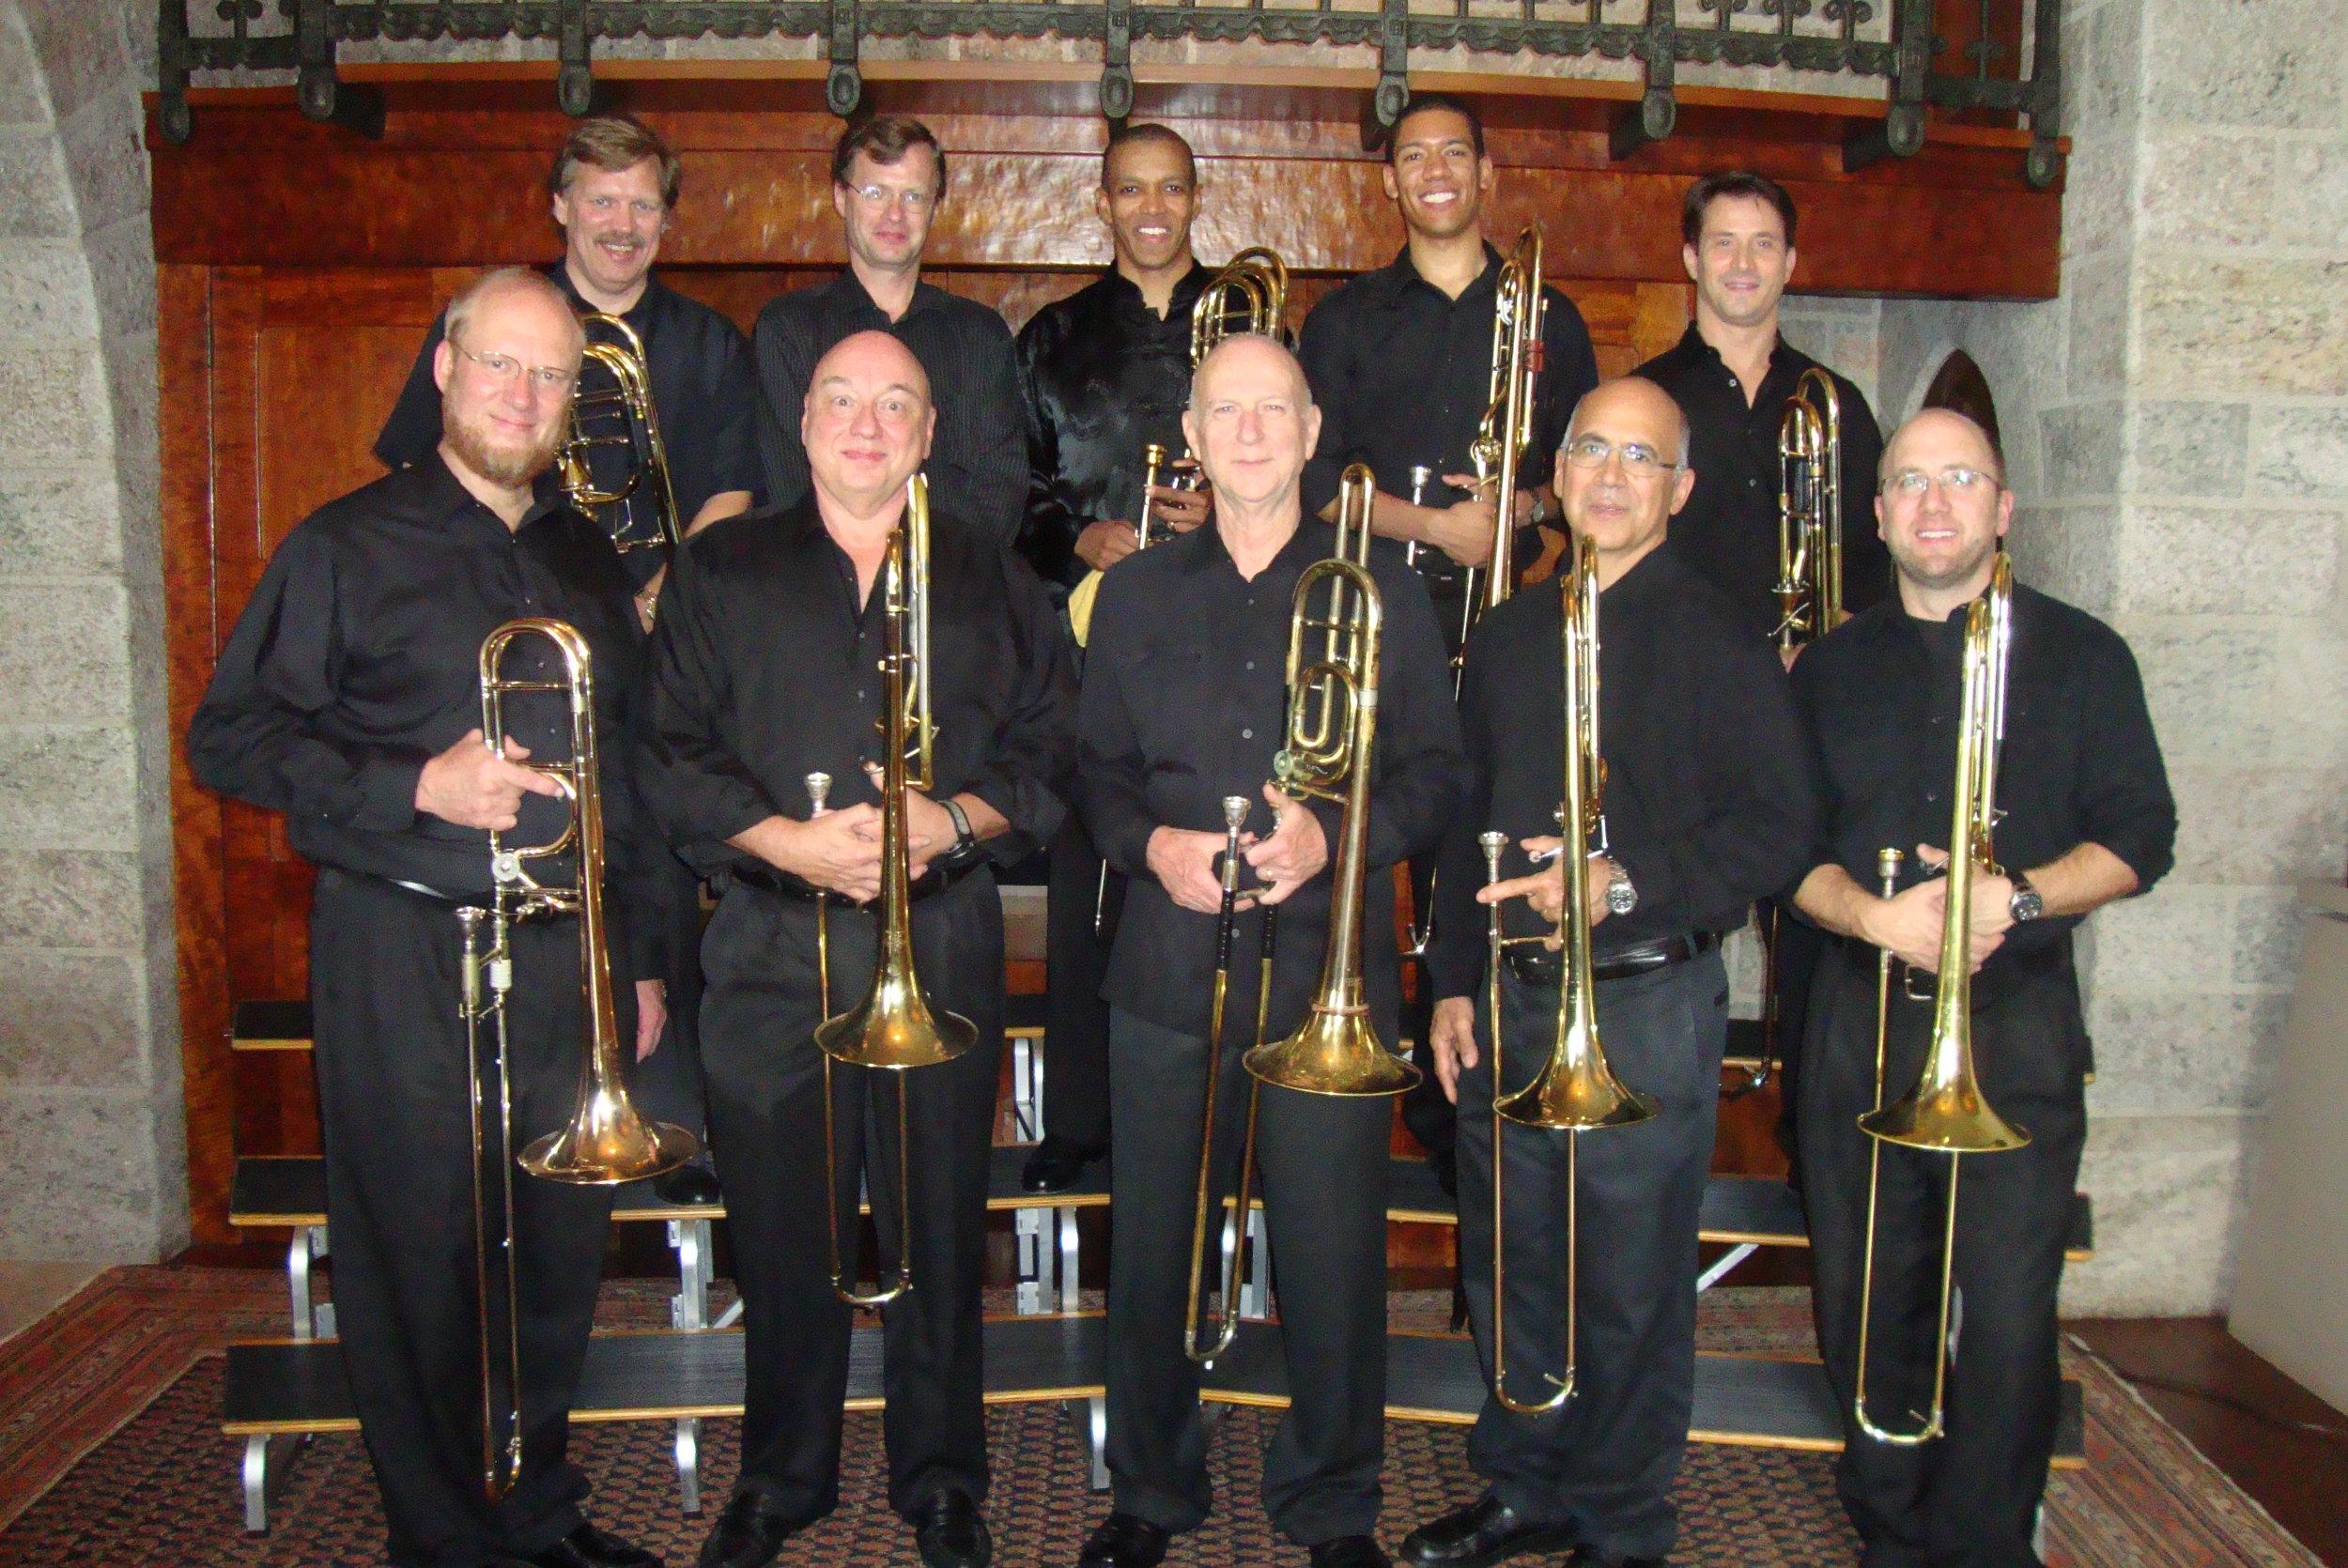 Posaune Decuple at their 2011 Glencairn concert.